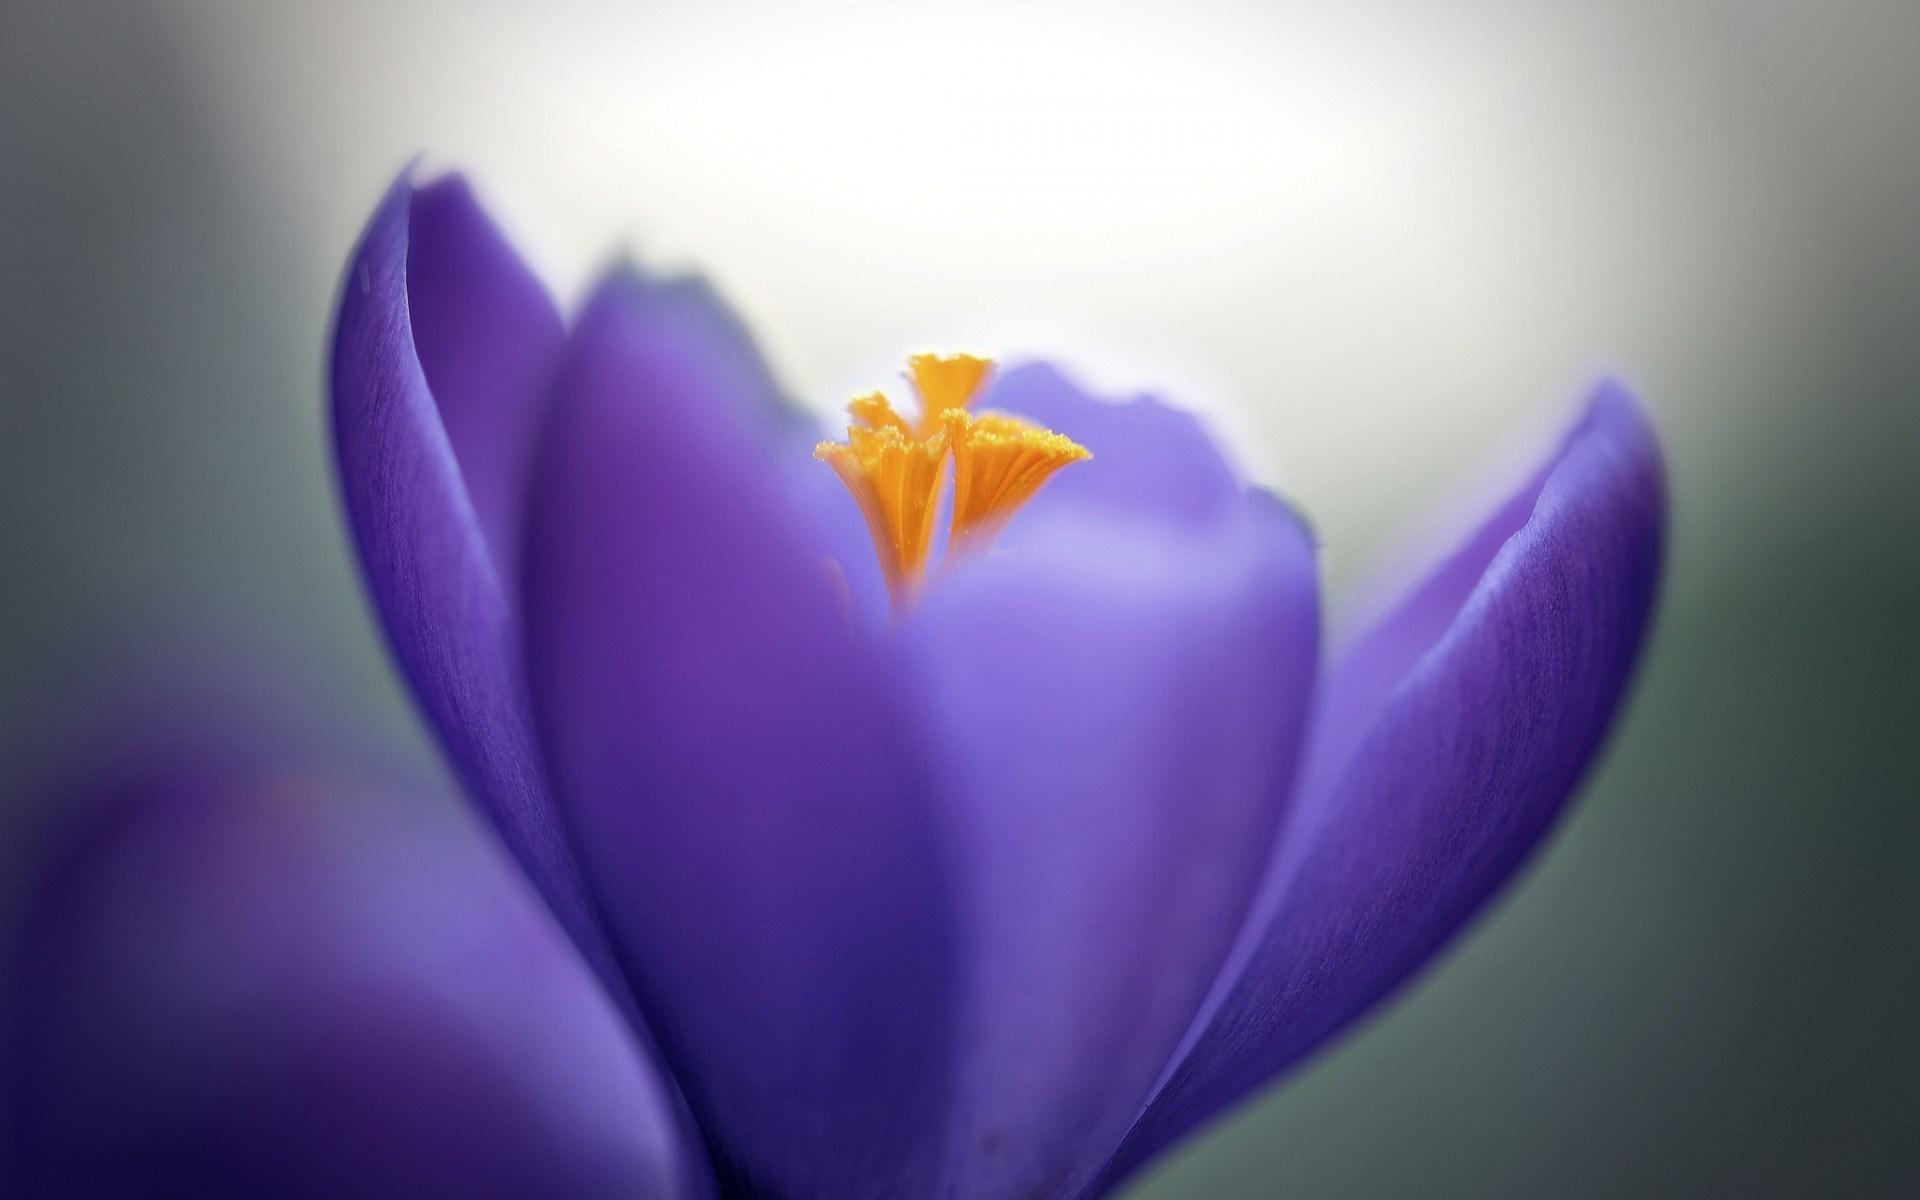 Crocus Lilac Flower Close-Up